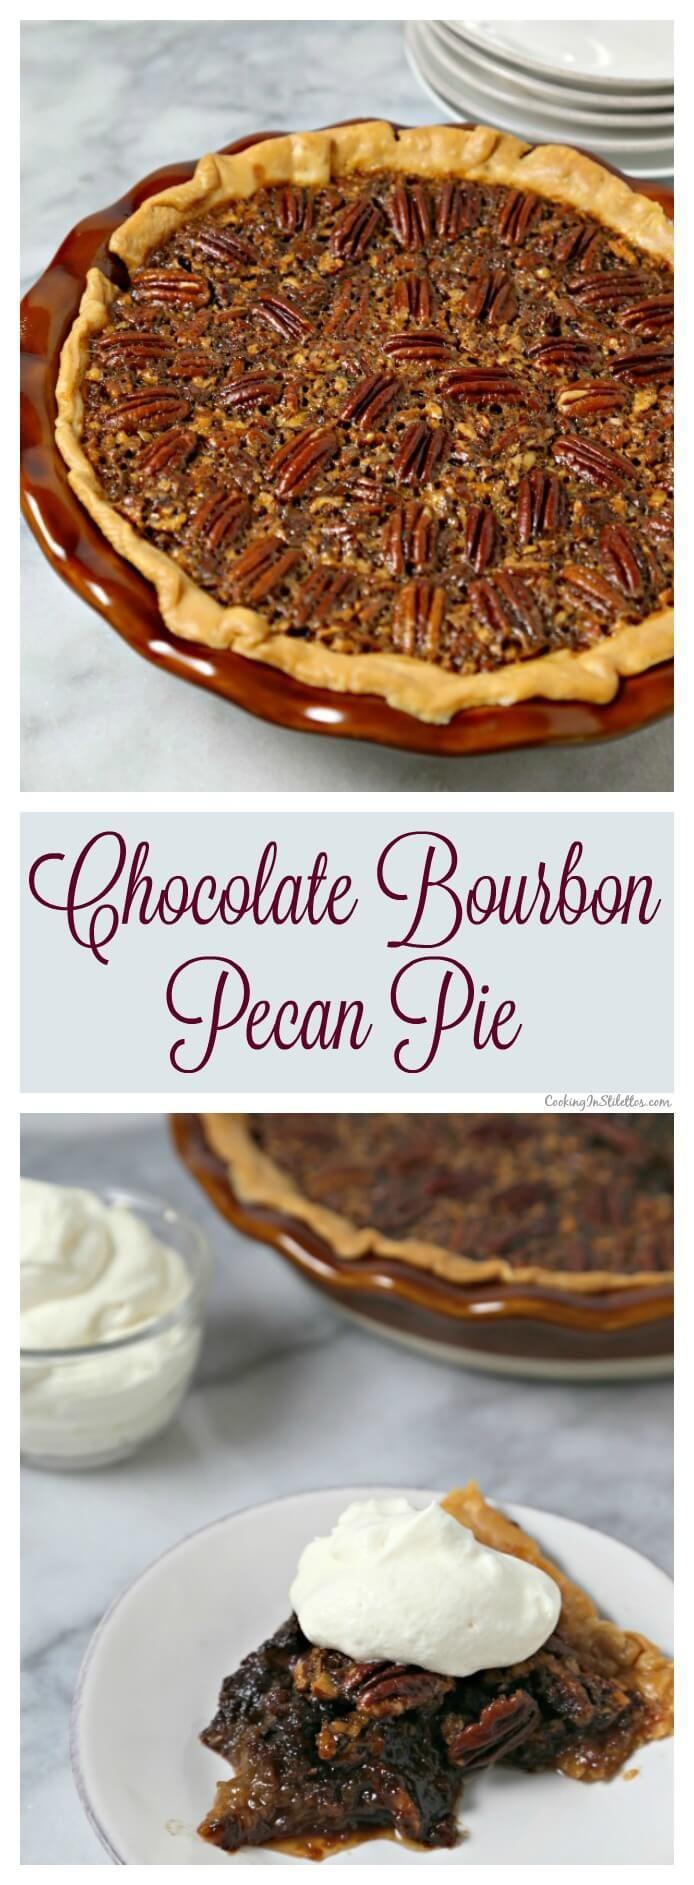 Best 10+ Chocolate bourbon pecan pie ideas on Pinterest ...